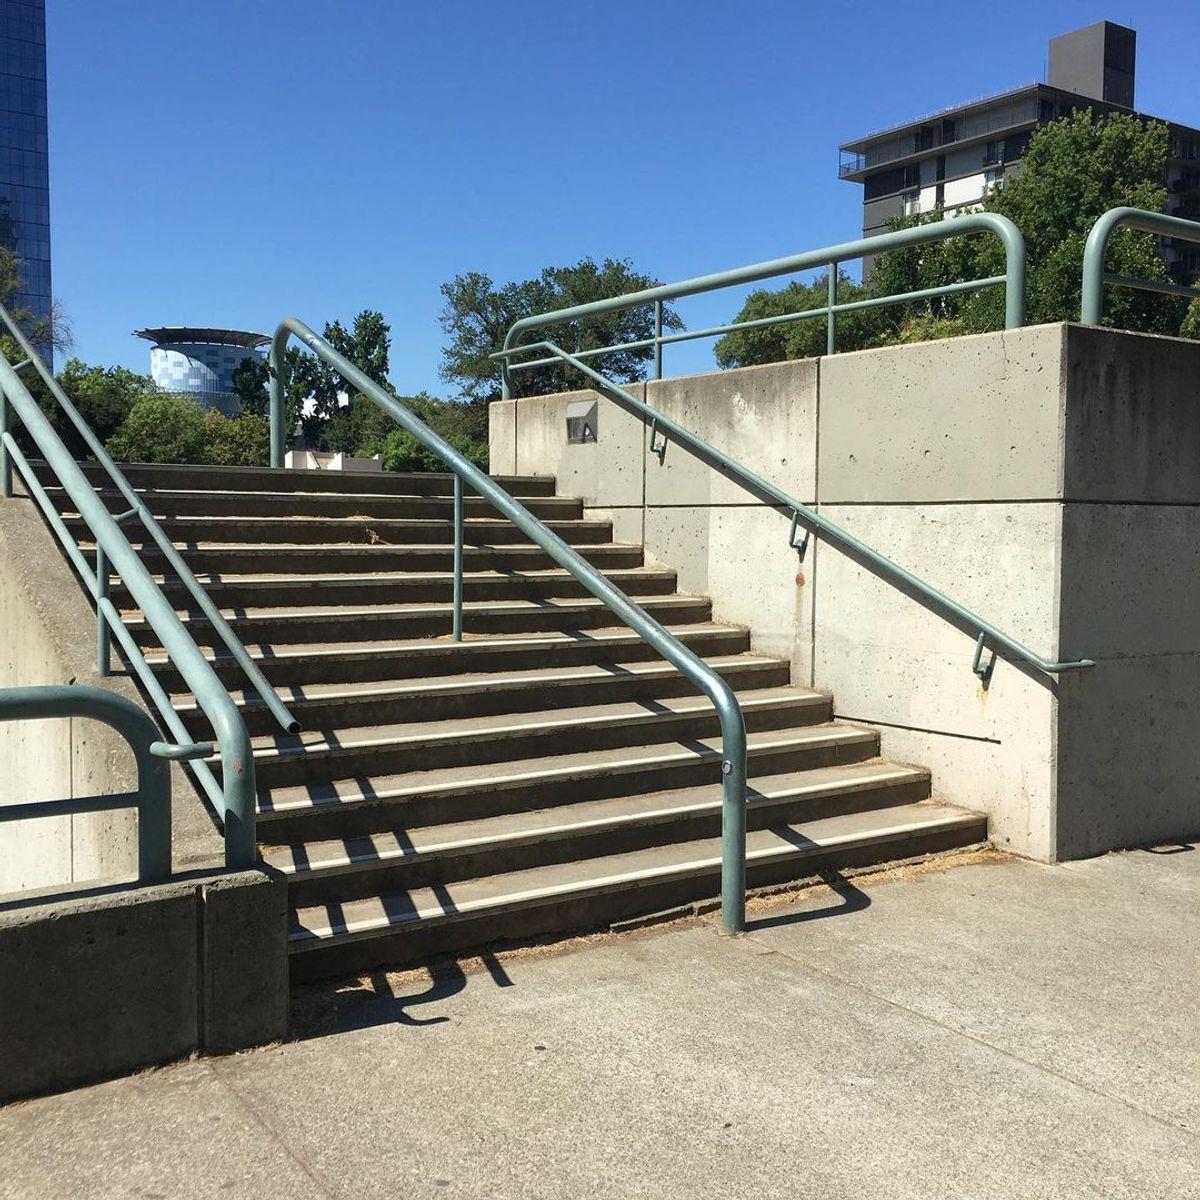 Image for skate spot 8th & O - 12 Stair Rail